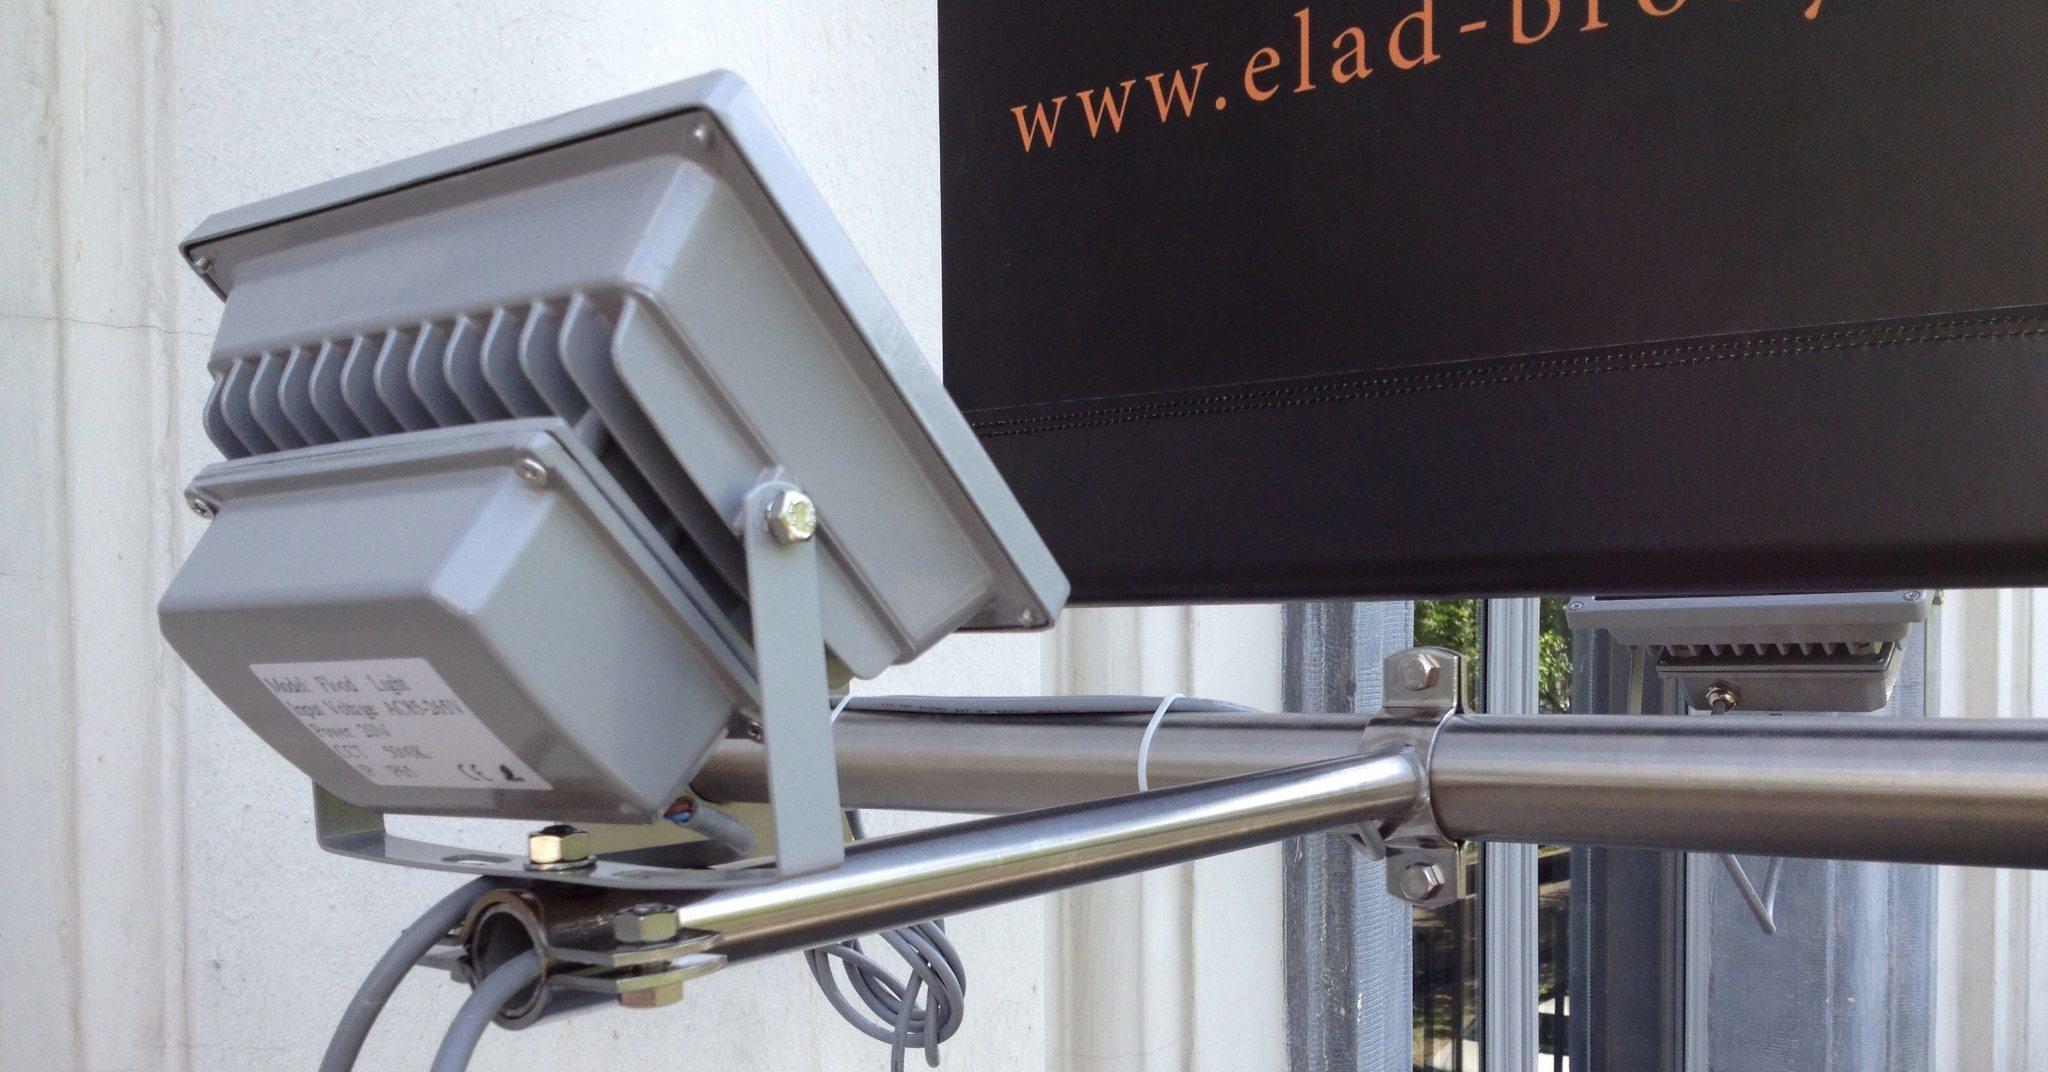 Uw banier verlicht aan gevel of mast - Art Vision